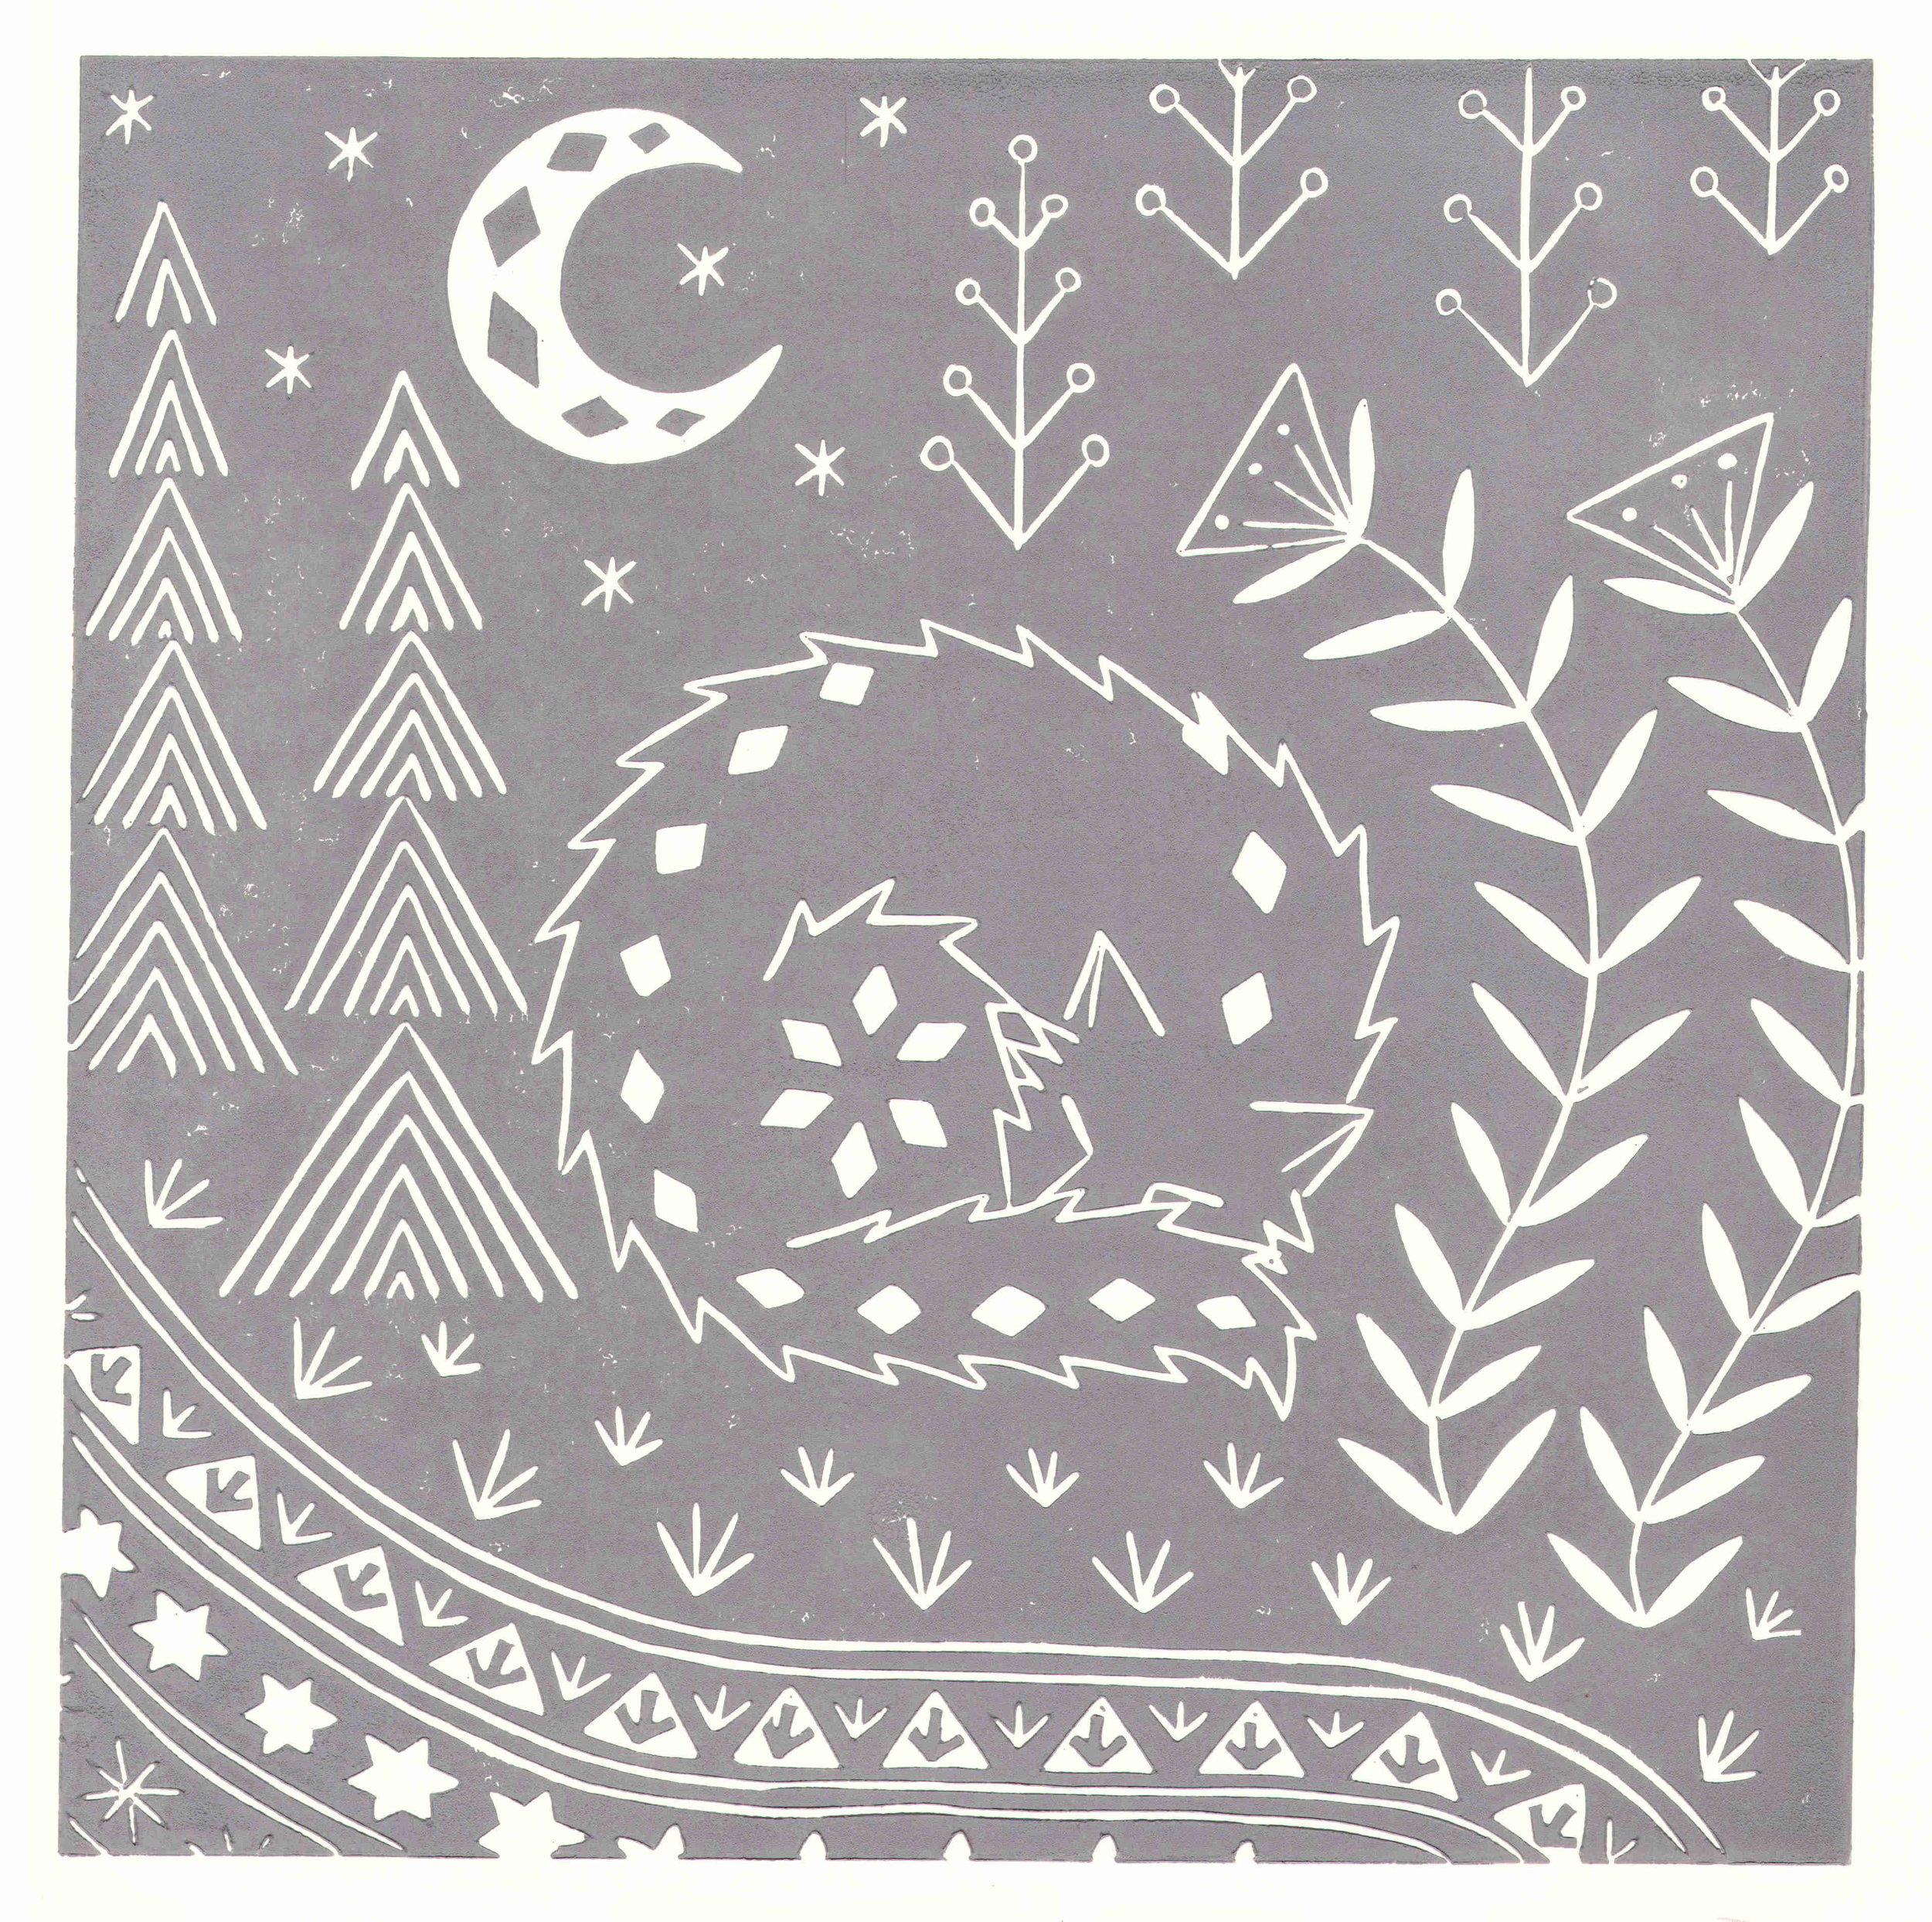 Connor Wolf Grey  linocut  30 x 30 cm  £45